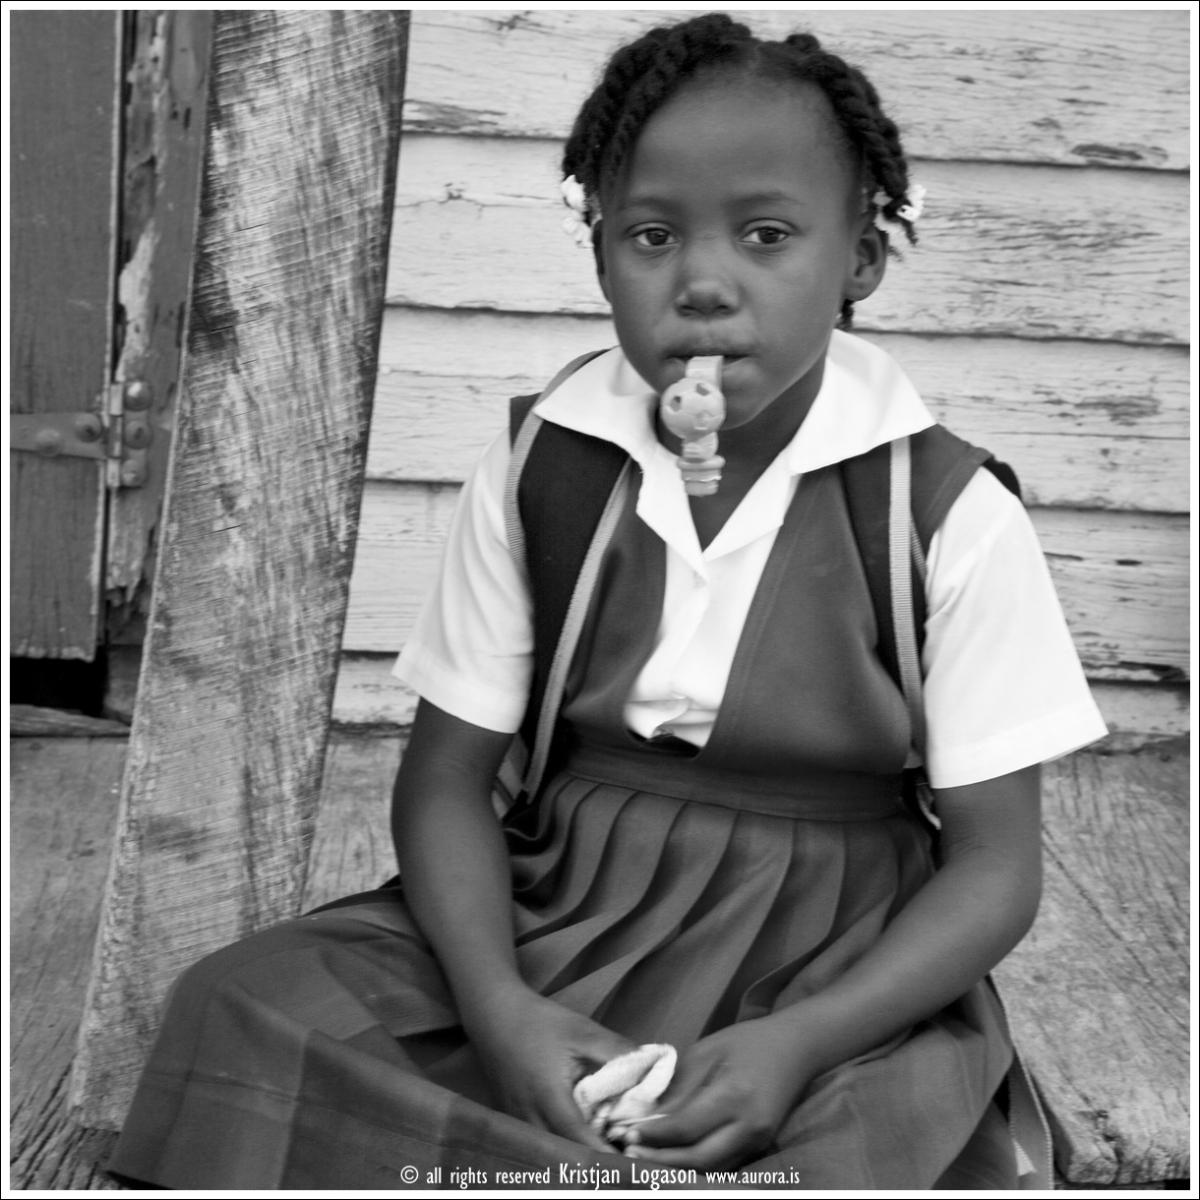 Young school girl with candy in Dangriga Belize